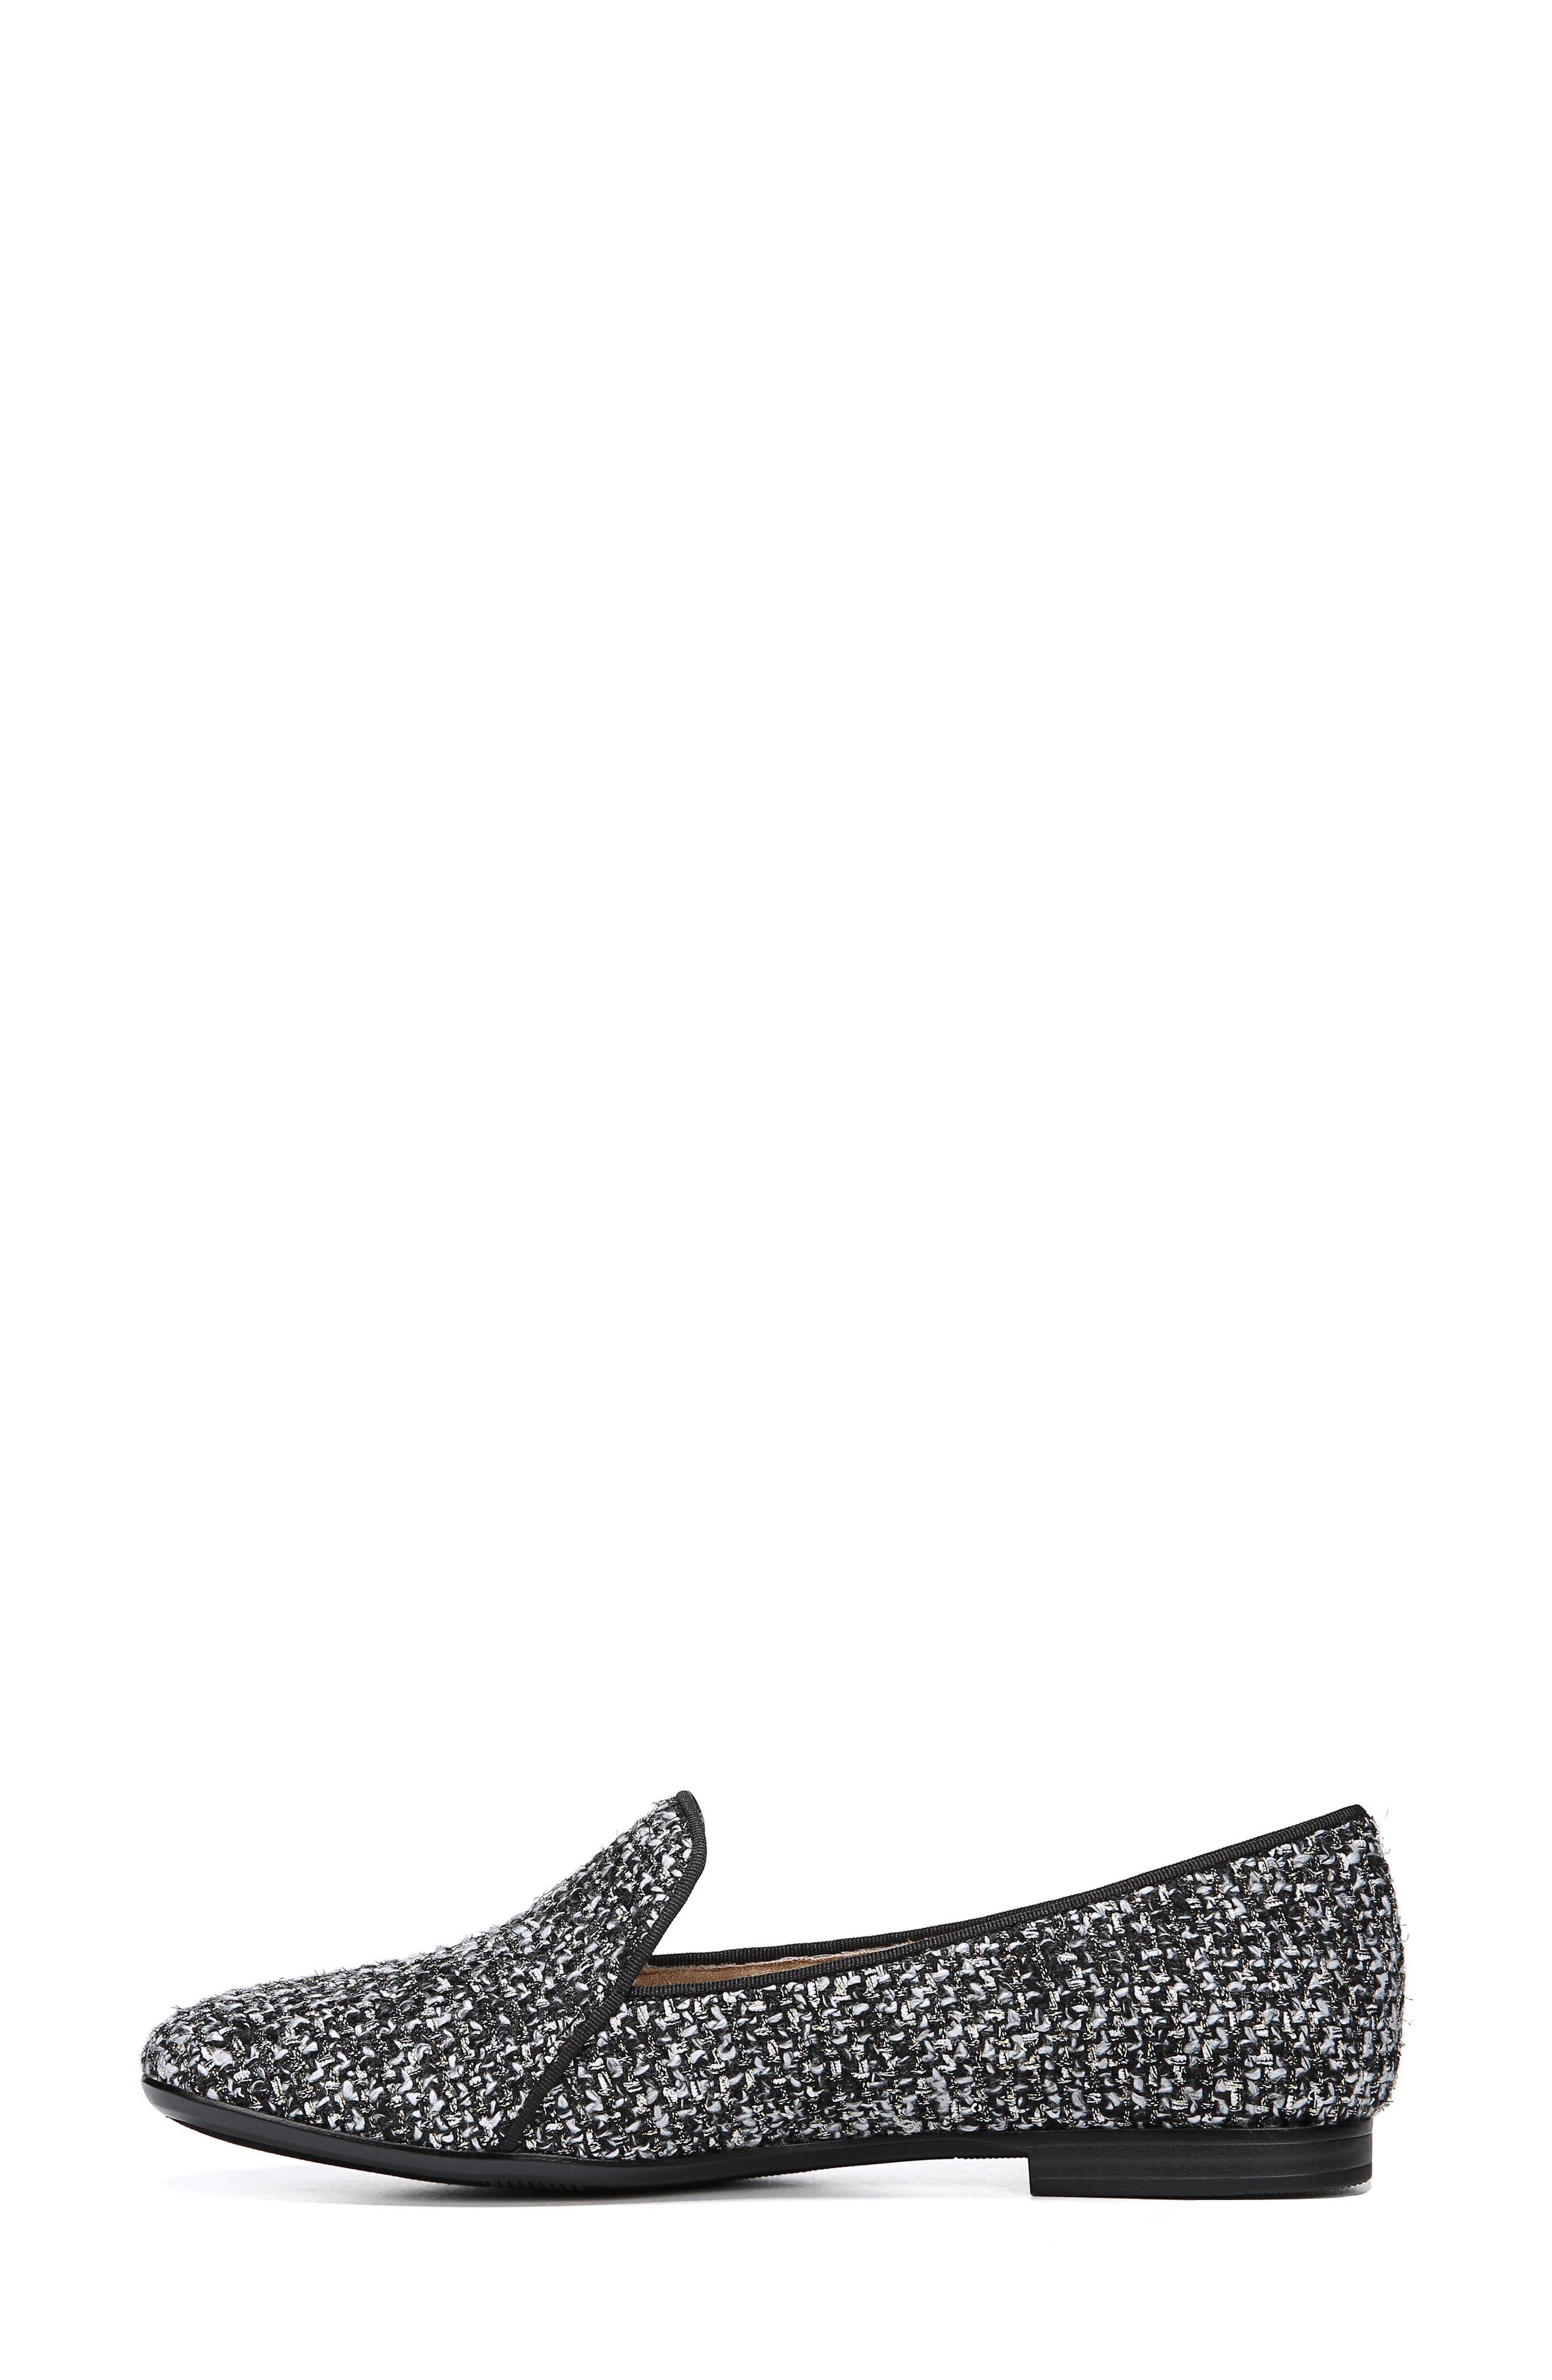 Emiline 2 Loafer,                             Alternate thumbnail 7, color,                             BLACK/ WHITE TWEED FABRIC